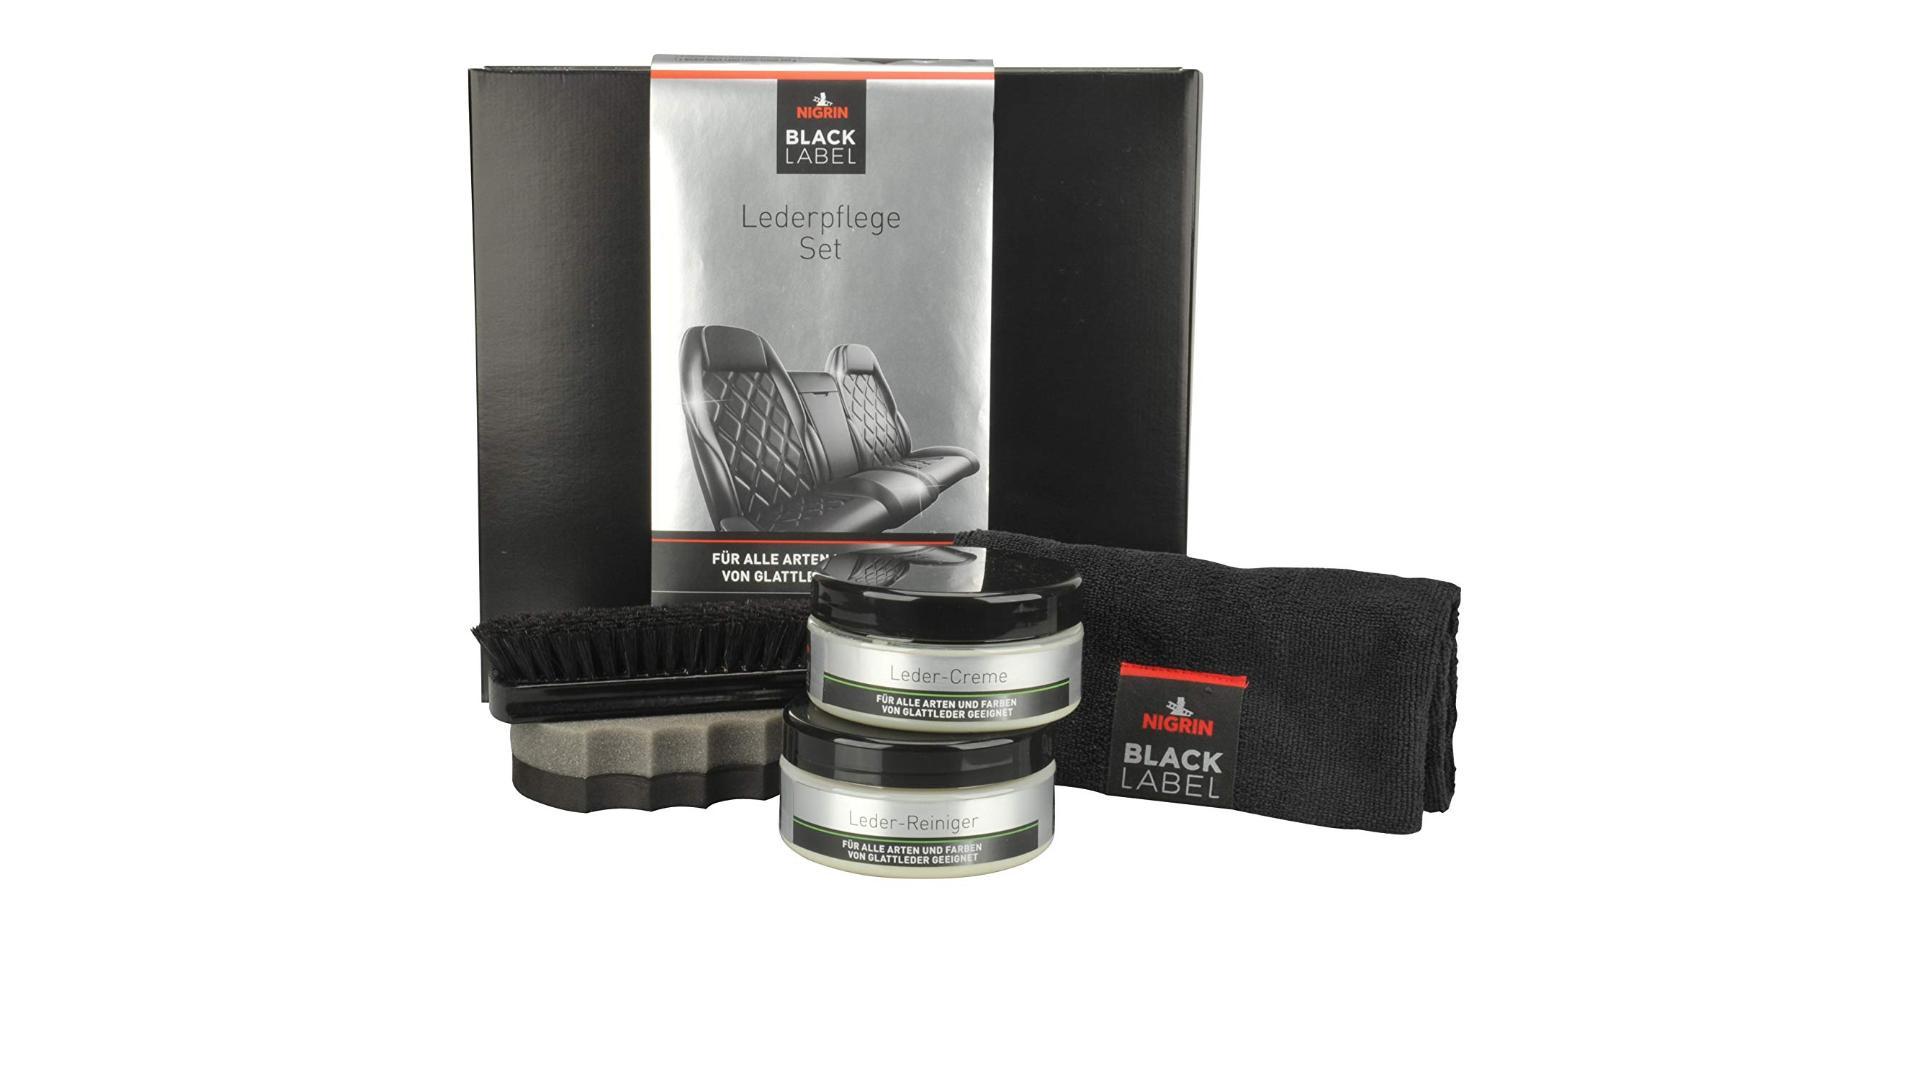 NIGRIN Leather Care Kit